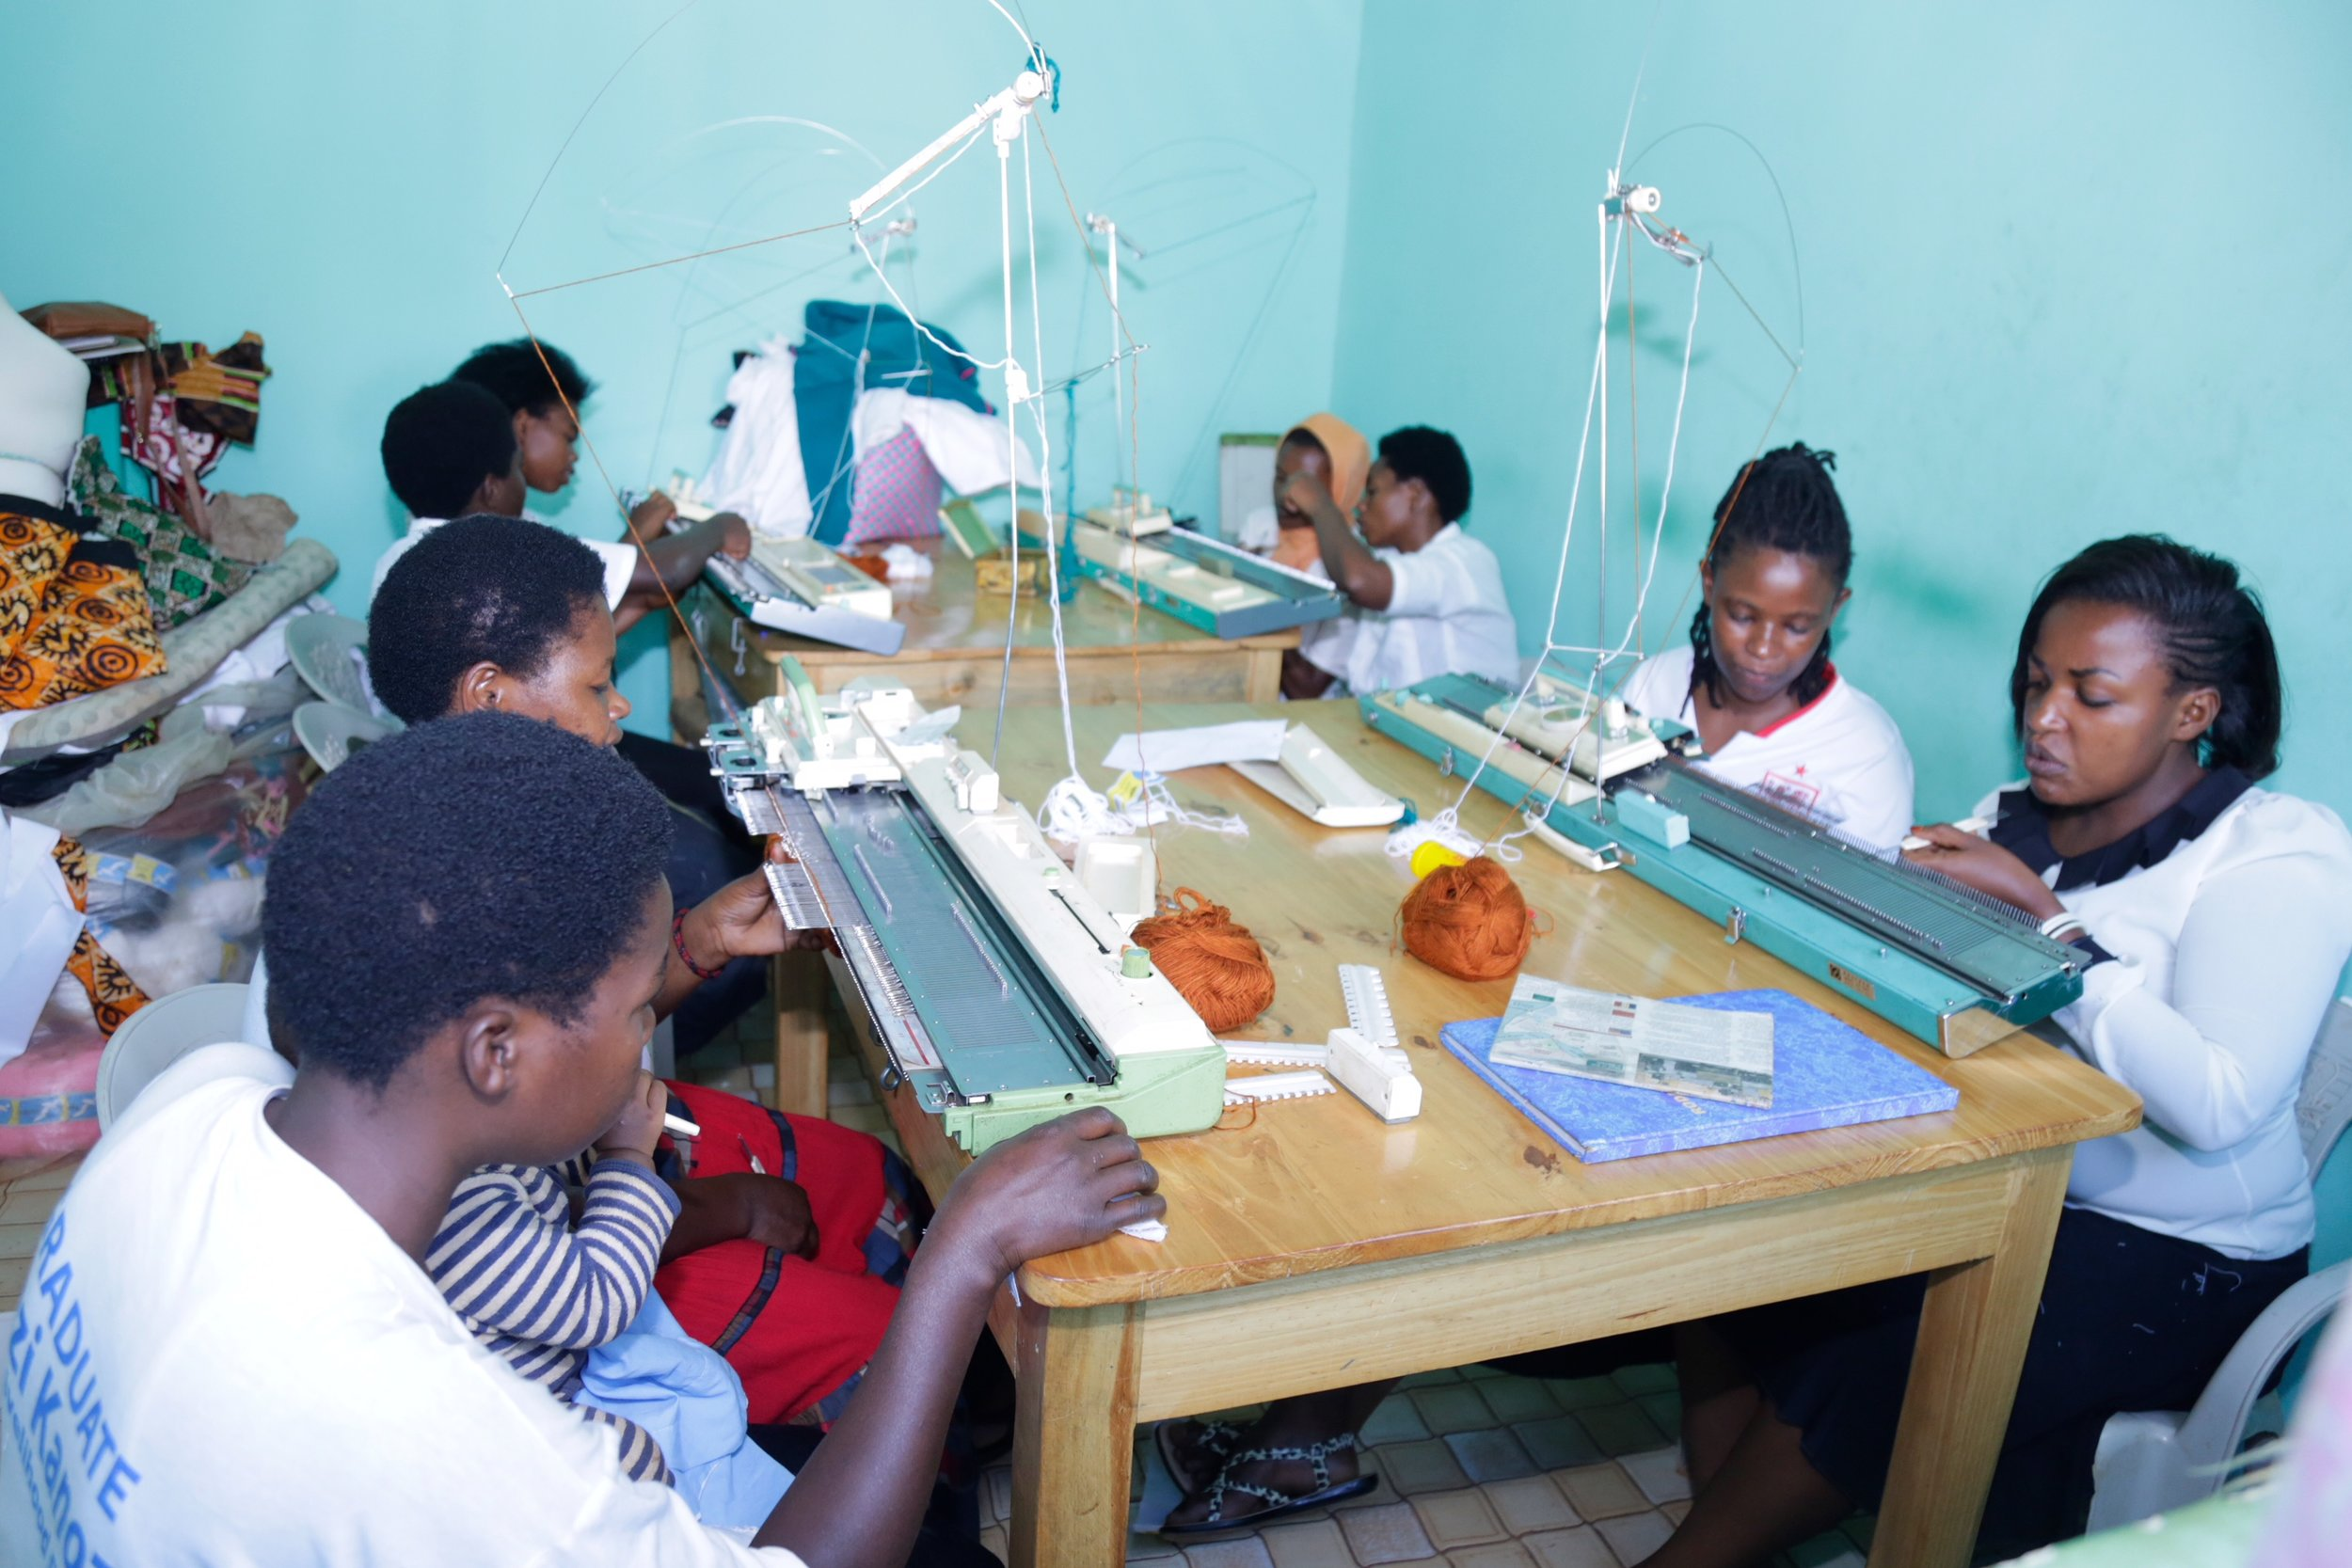 Learning new skills through the NDASHOBOYE 2018 program.